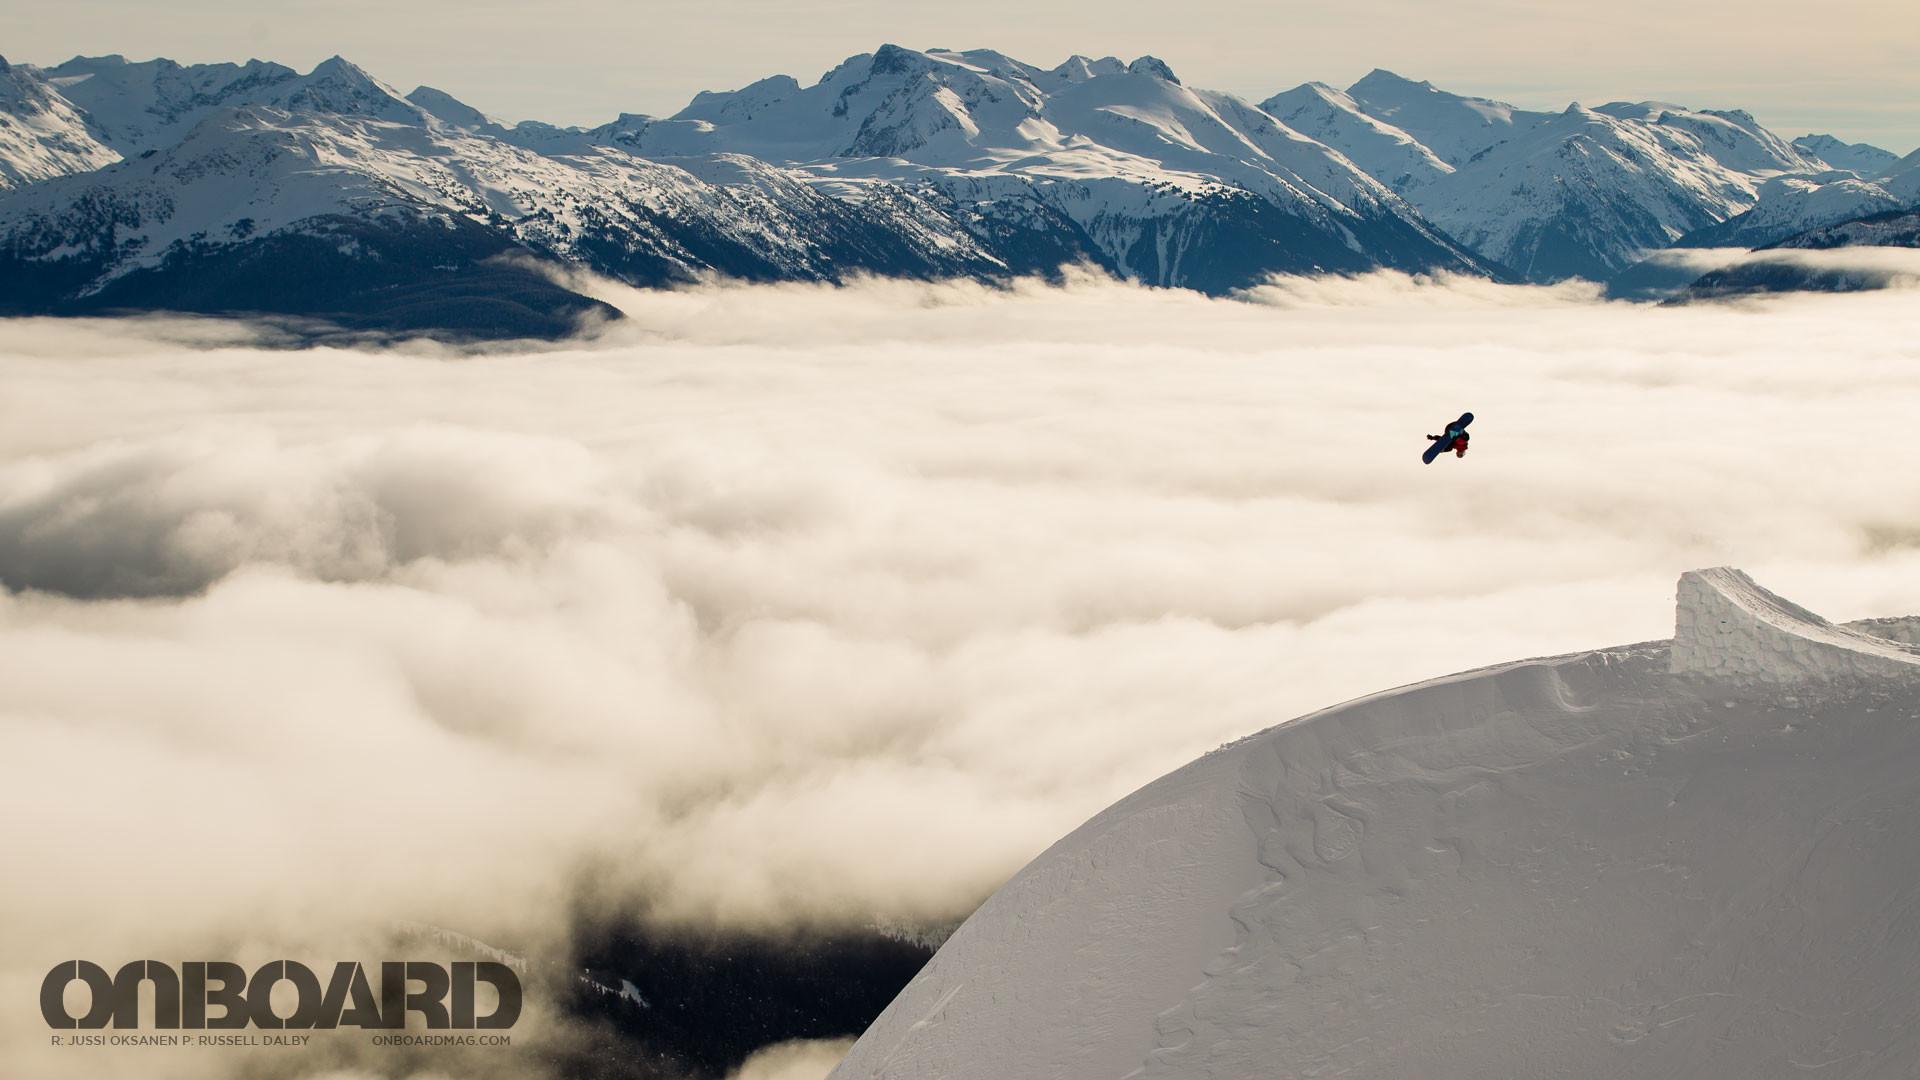 Wallpaper Hd Snowboarding Wallpaper Iphone: Snowboarding Wallpaper (74+ Images